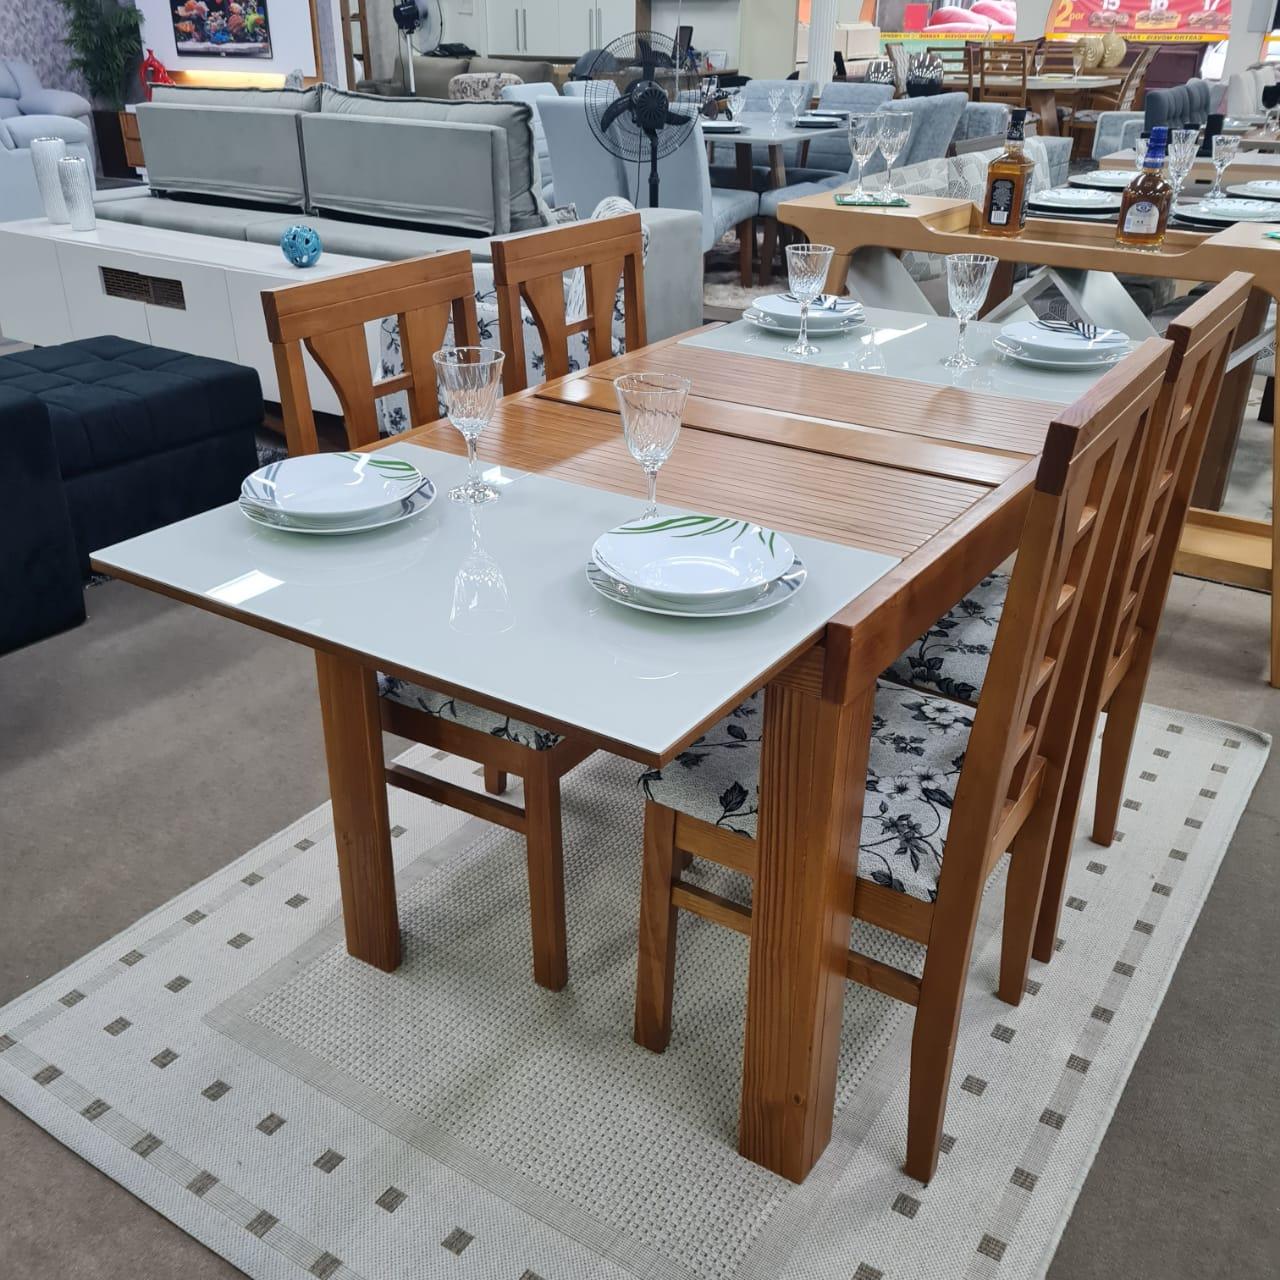 Sala de Jantar Mesa Elástica Londres com 4 Cadeiras Olinda